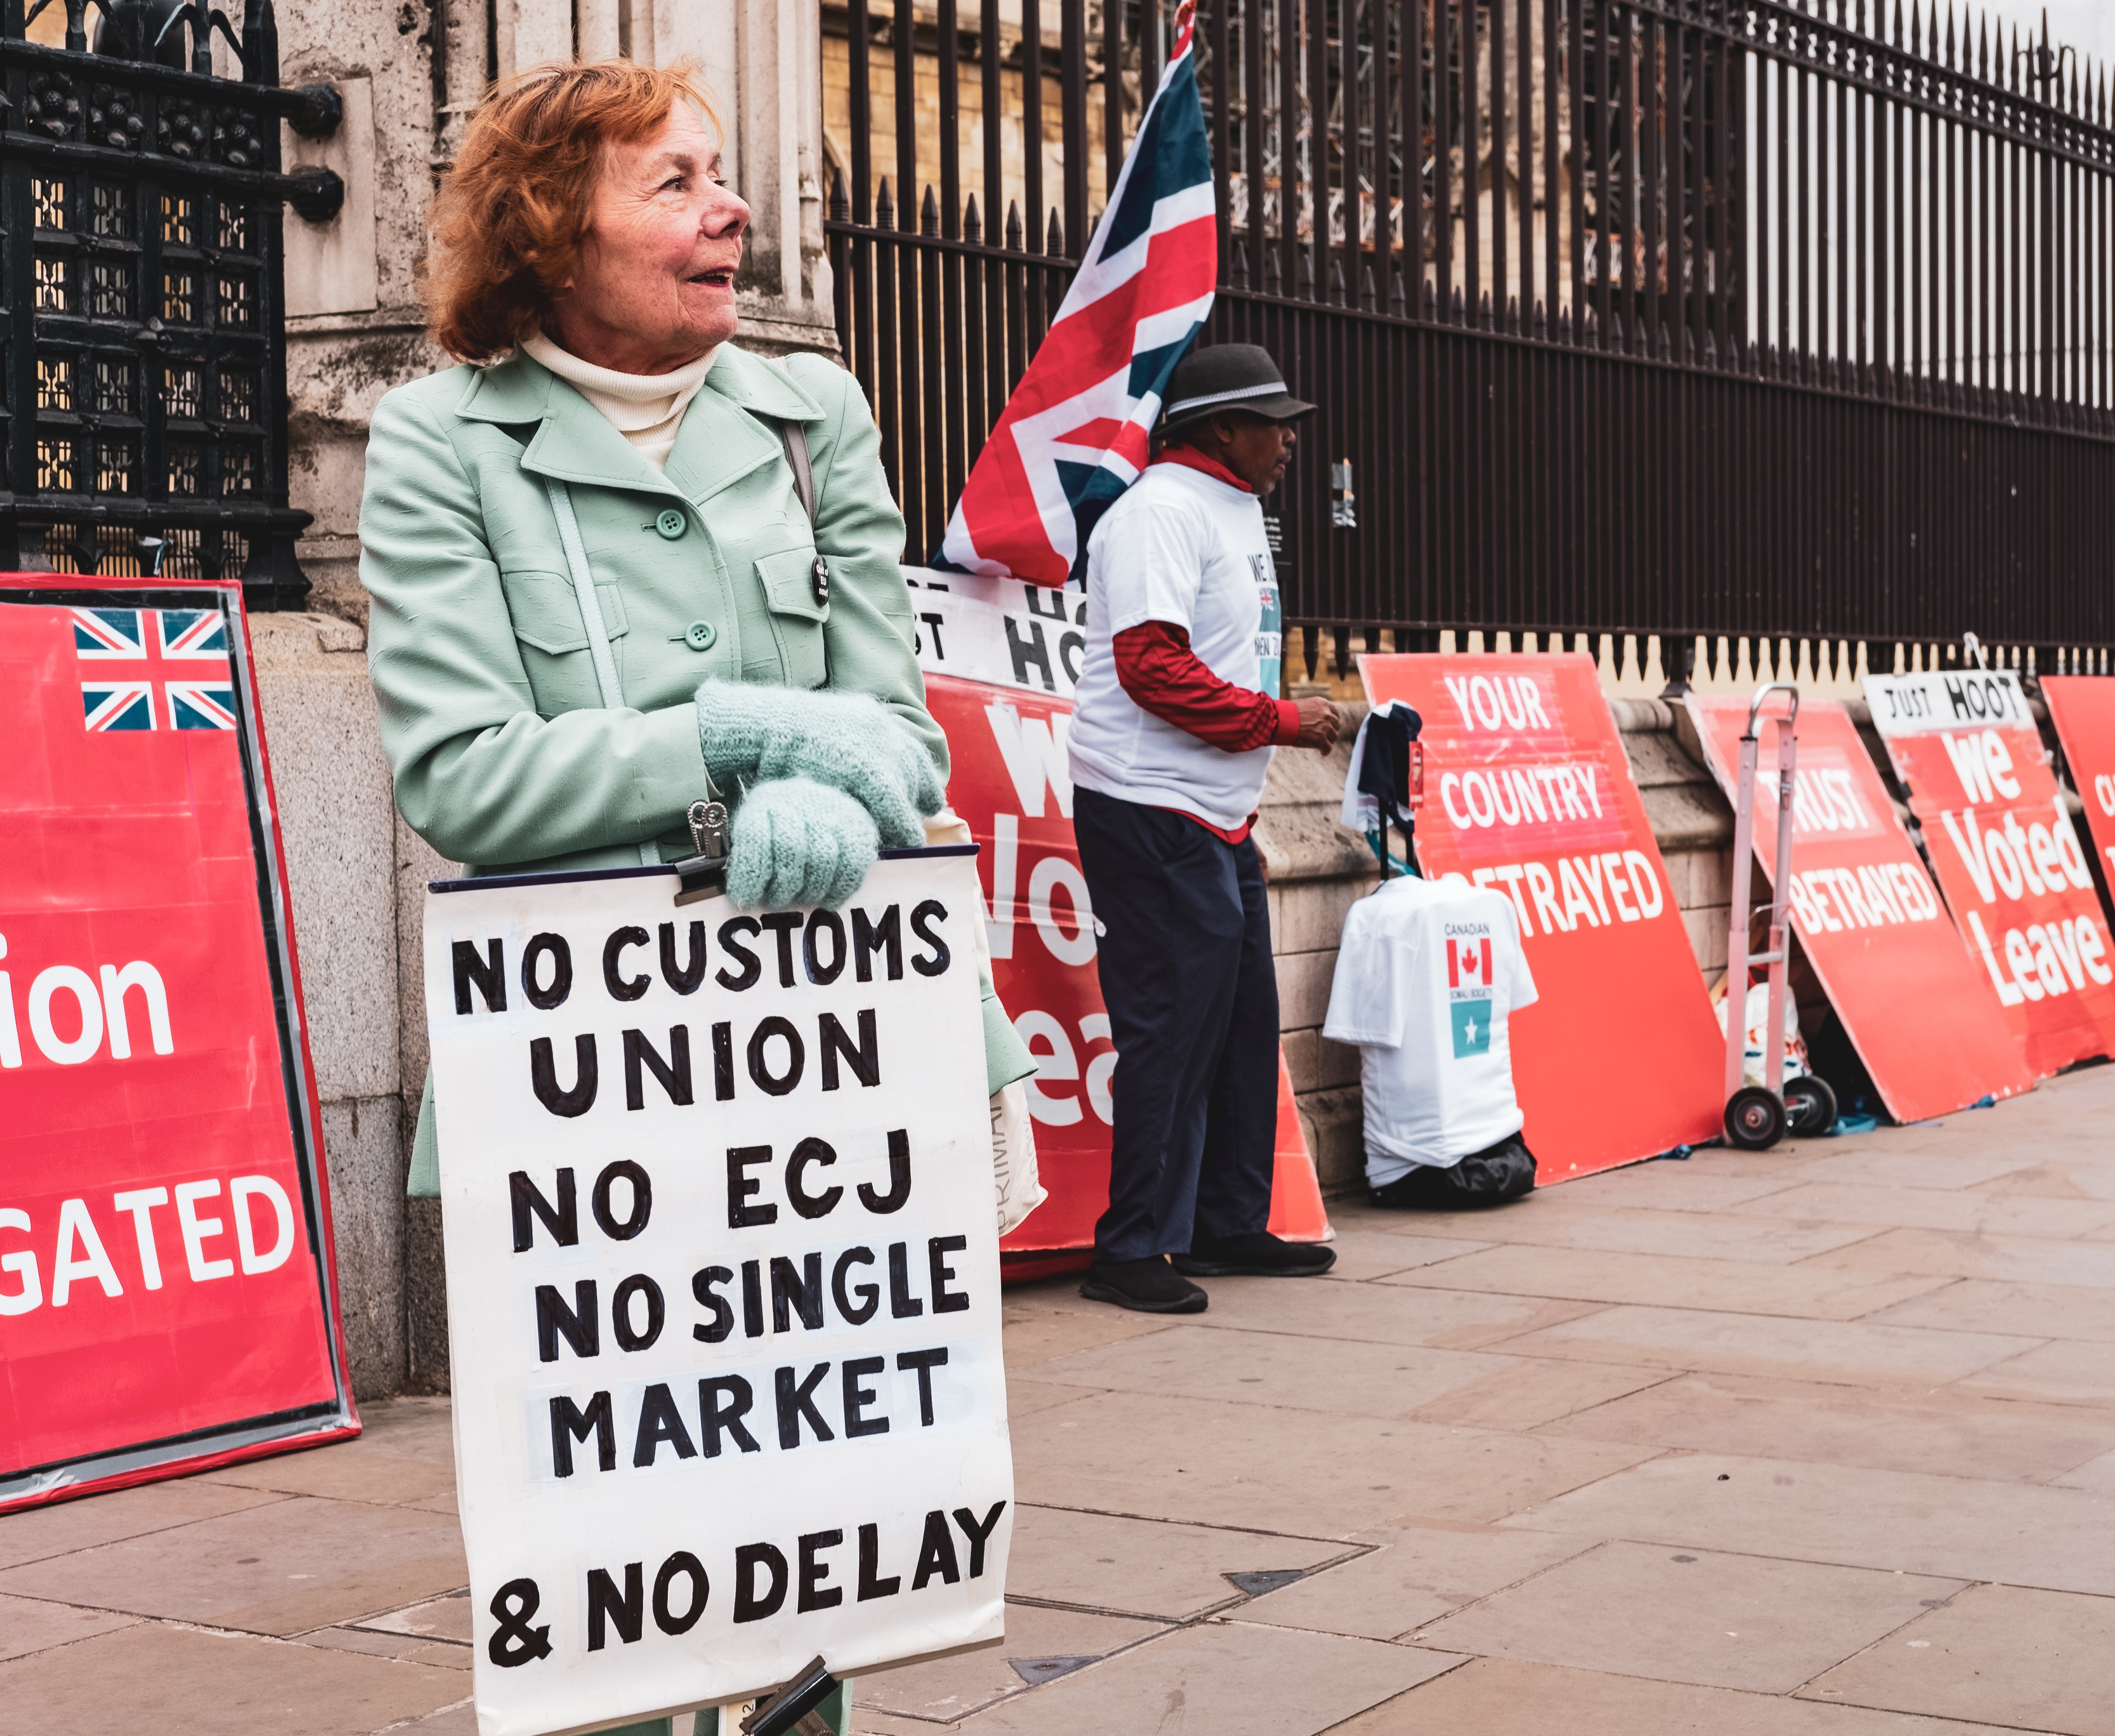 smiling woman holding No Customs Union No Ecj signage